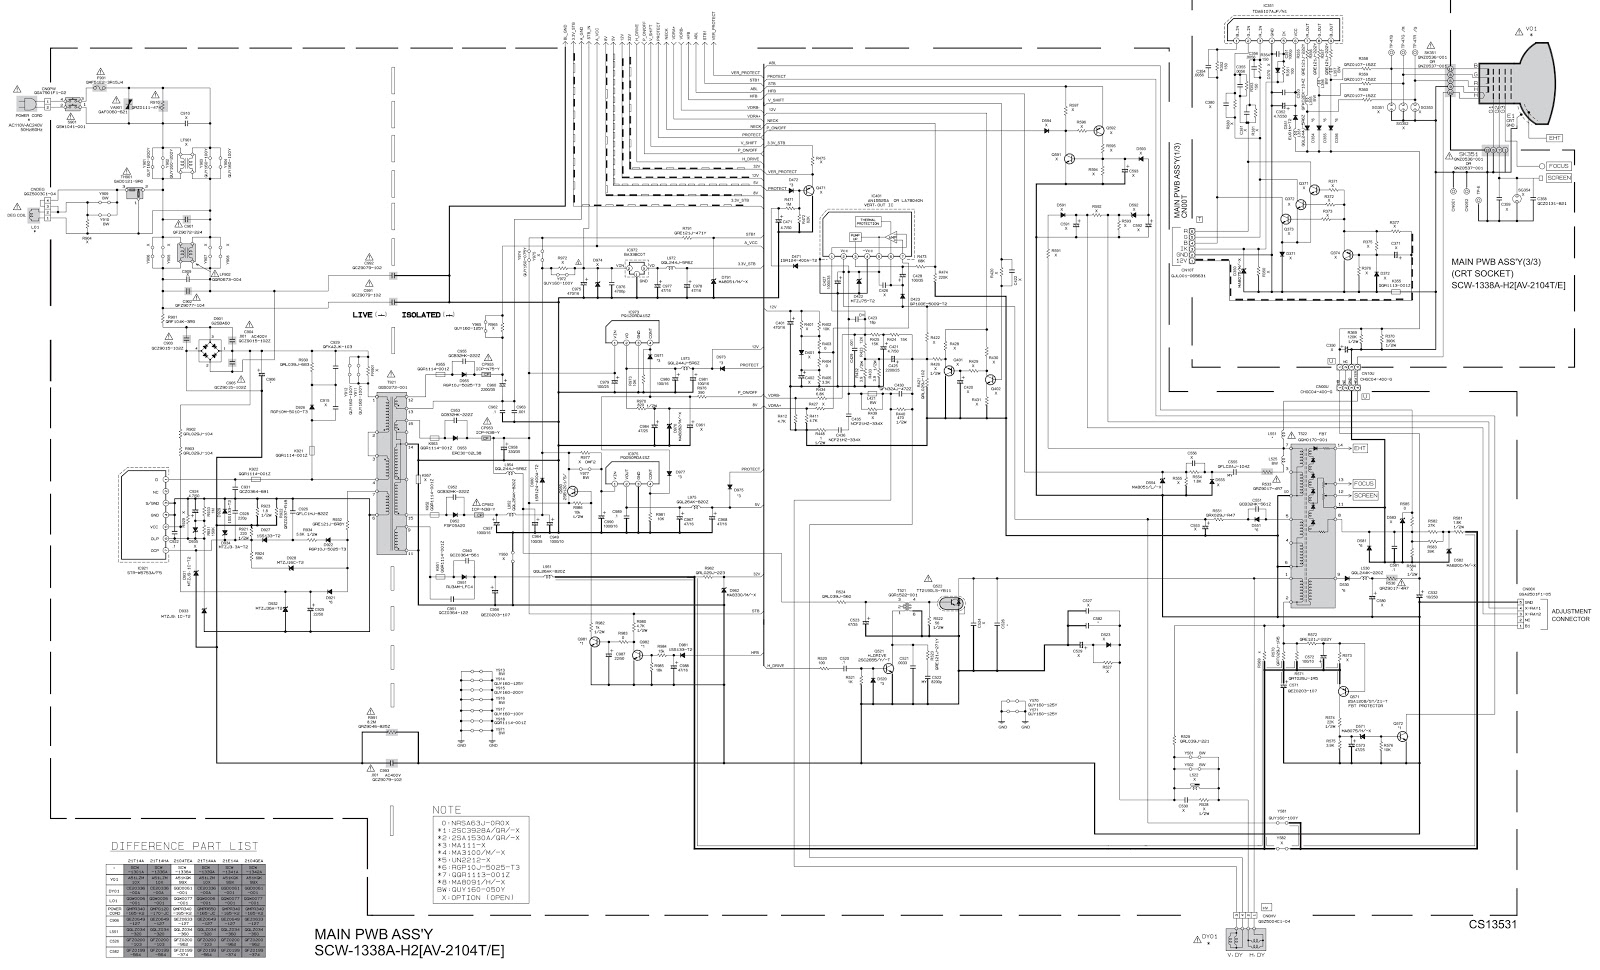 Jvc Tv Diagram - Wiring Diagram Srv Jvc Kd R Wiring Diagram on jvc kd r520 wiring-diagram, jvc kd s28 wiring-diagram, jvc kw-r500 wiring harness diagram, jvc kd s37 wiring-diagram, jvc kd r540 wiring, jvc kd s15 wiring-diagram, jvc kd r 330 manual, jvc kd r330 installation, jvc cd player wiring-diagram, jvc kd s39, jvc kd lx111 plug, jvc car audio wiring harness,